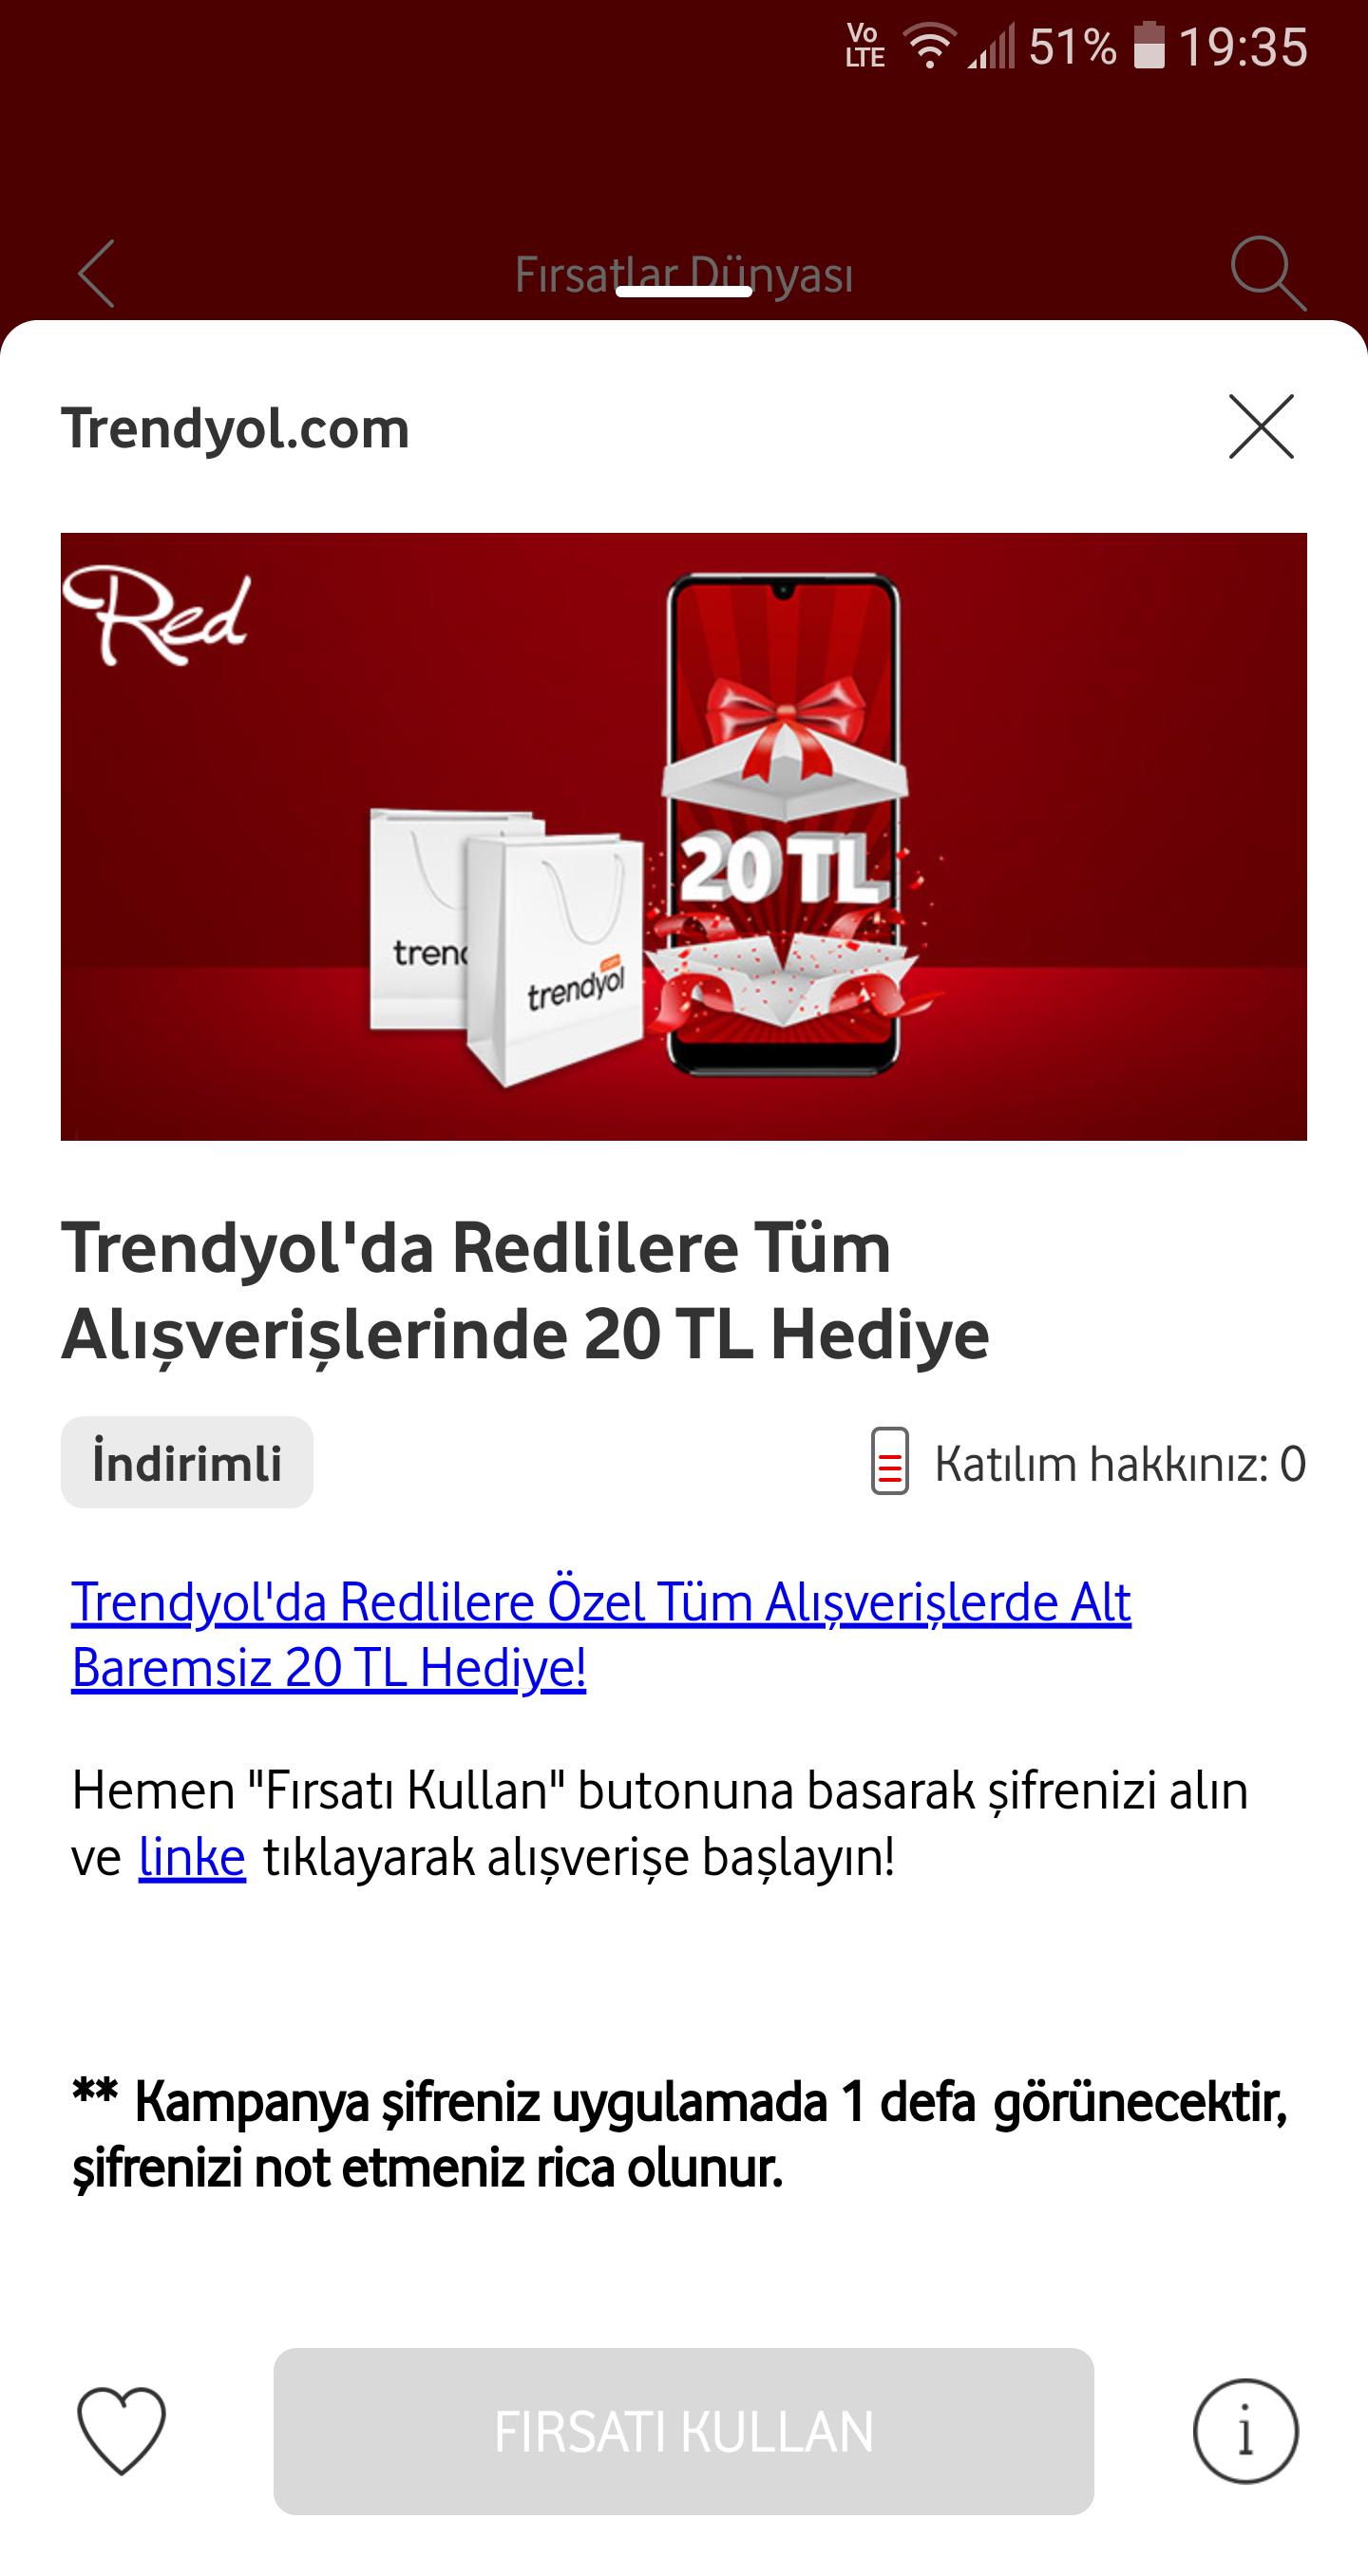 Trendyol Vodafone ve Red'lilere 20₺ İndirim Kodu - Altlimitsiz